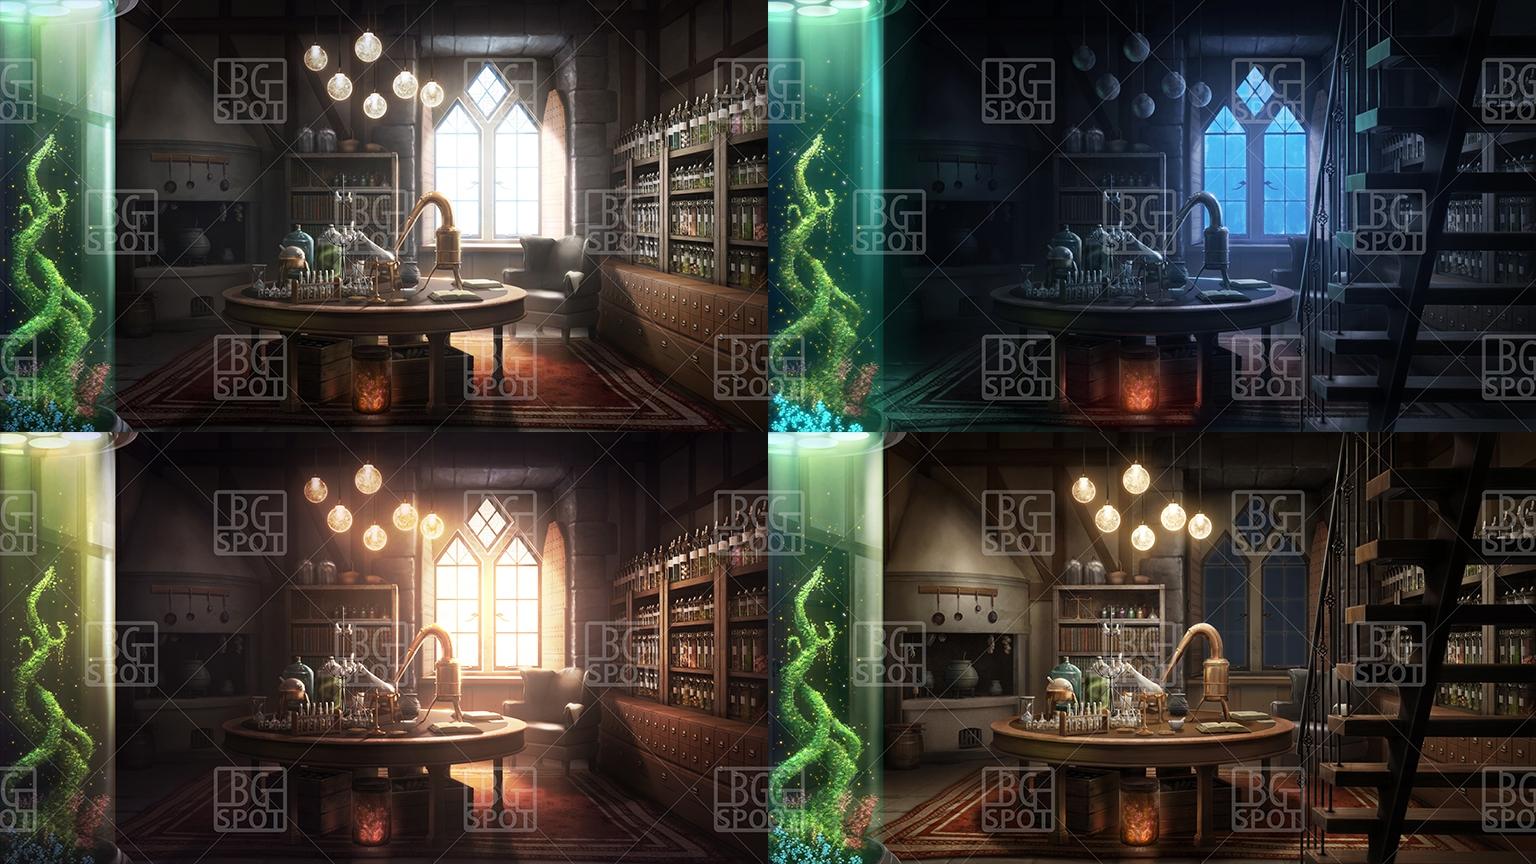 BG_中世の風呂場(商品番号:RJ326680)